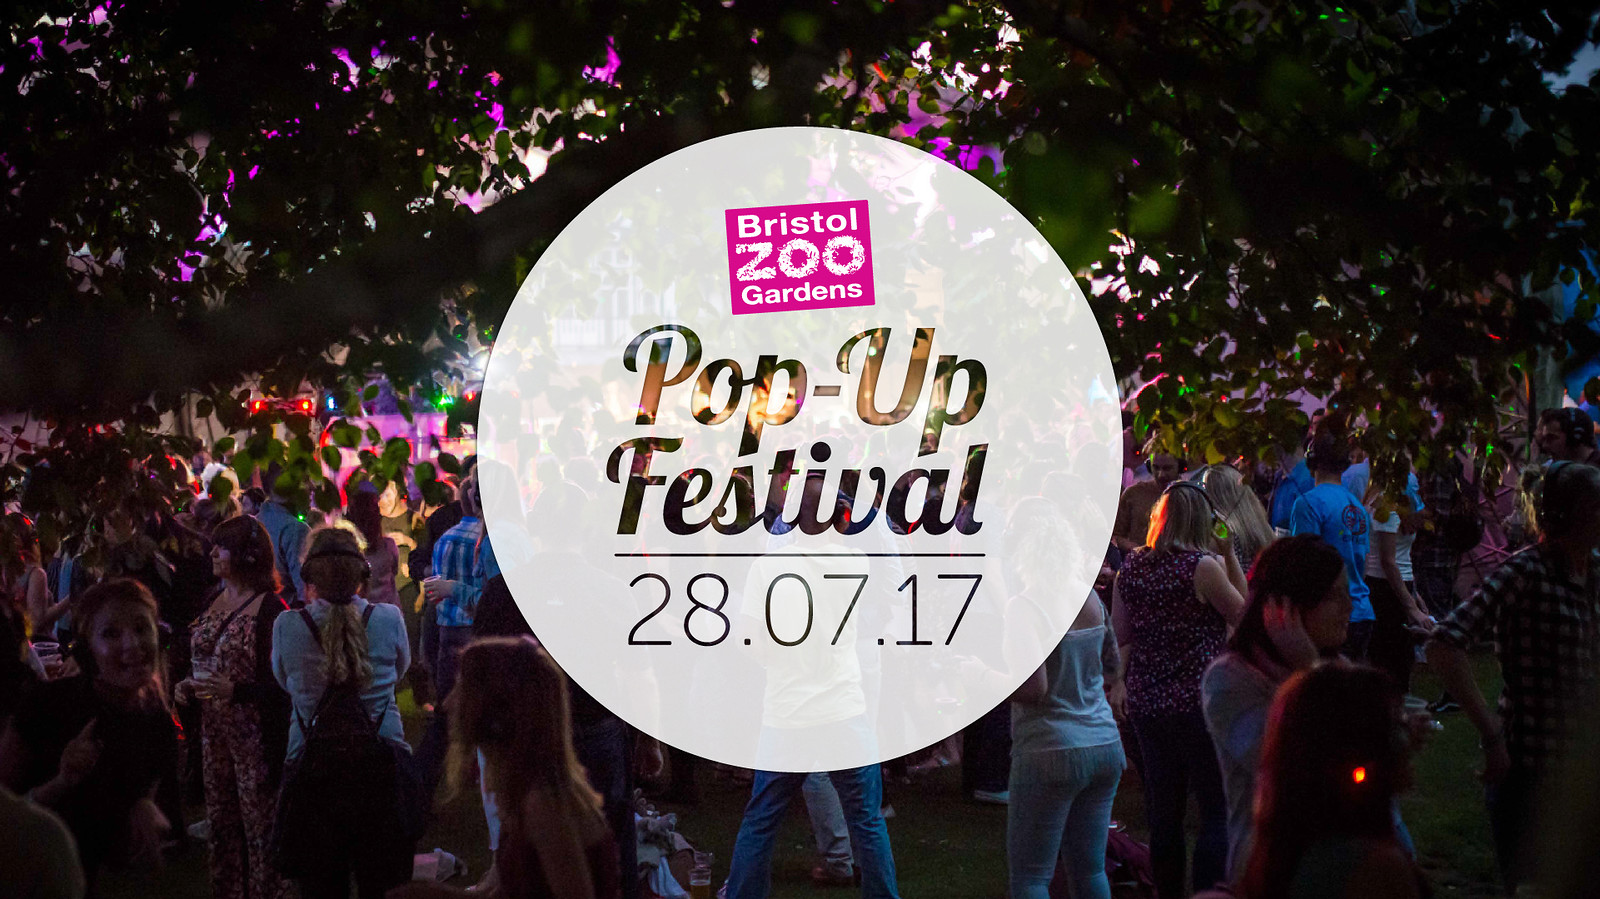 Pop Up Zoos : Bristol zoo s pop up festival gardens